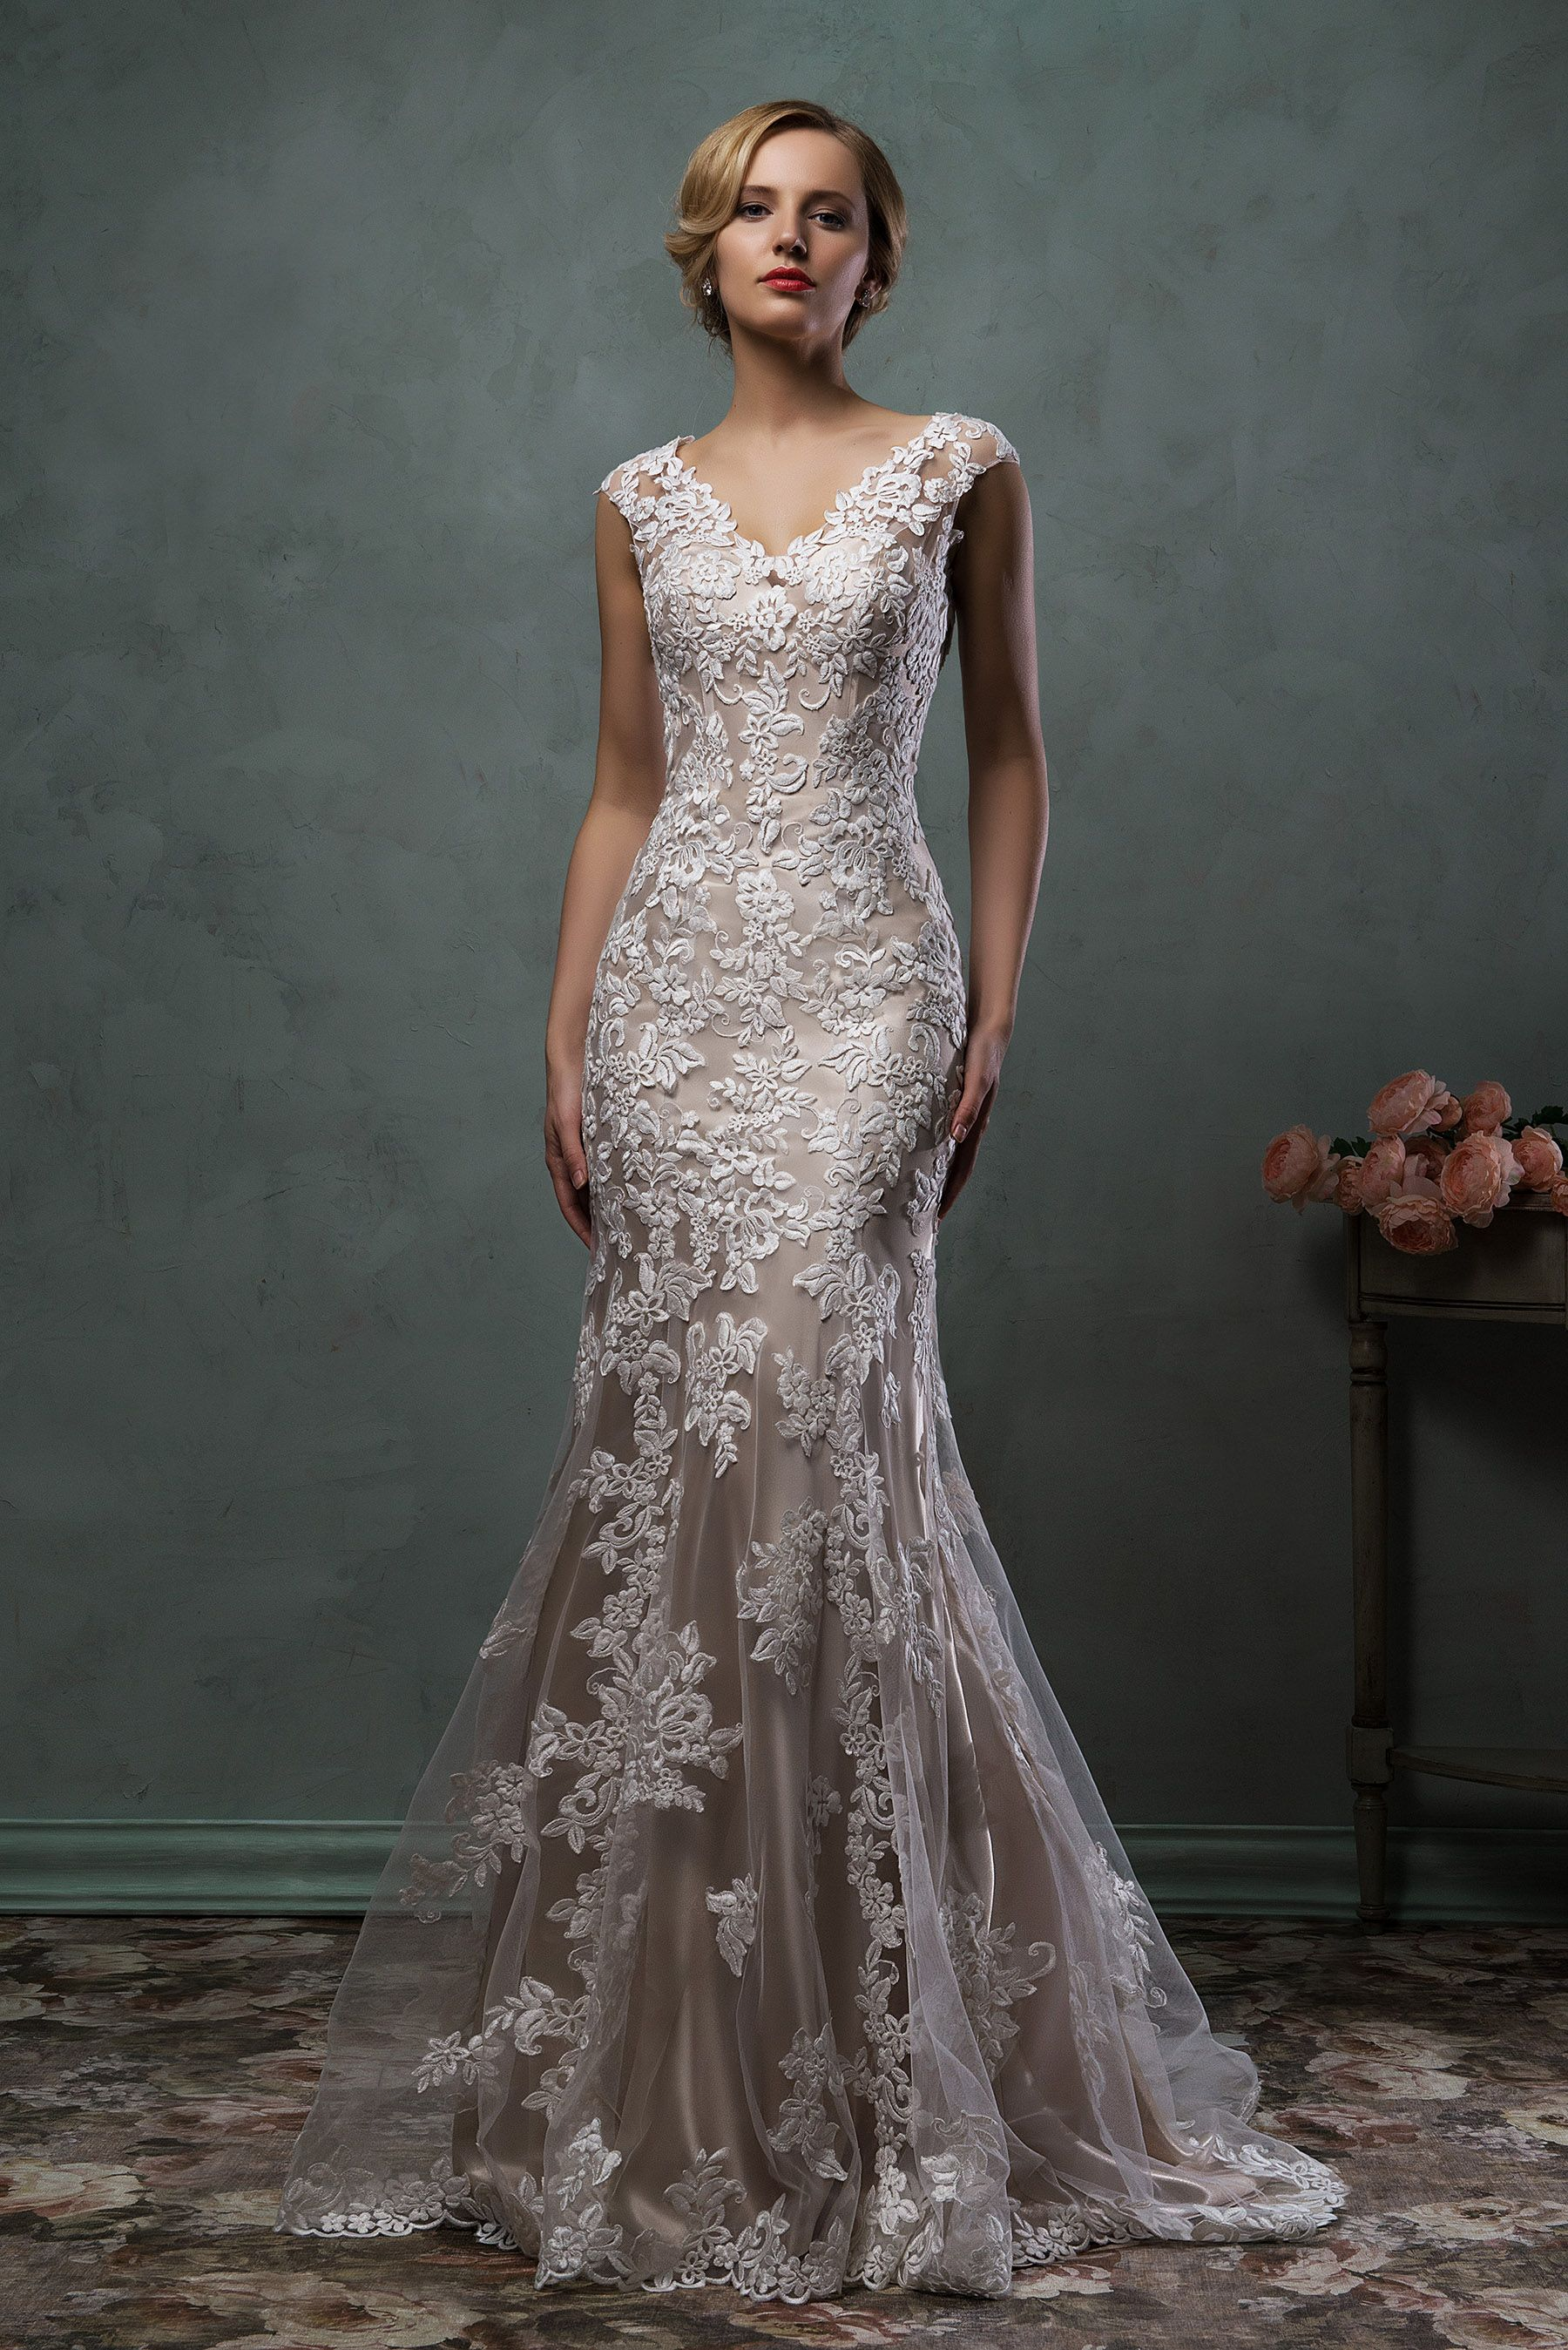 Champagne colored wedding dress  Wedding Dress Alba Silhouette Sheath  Mermaid  Dress in